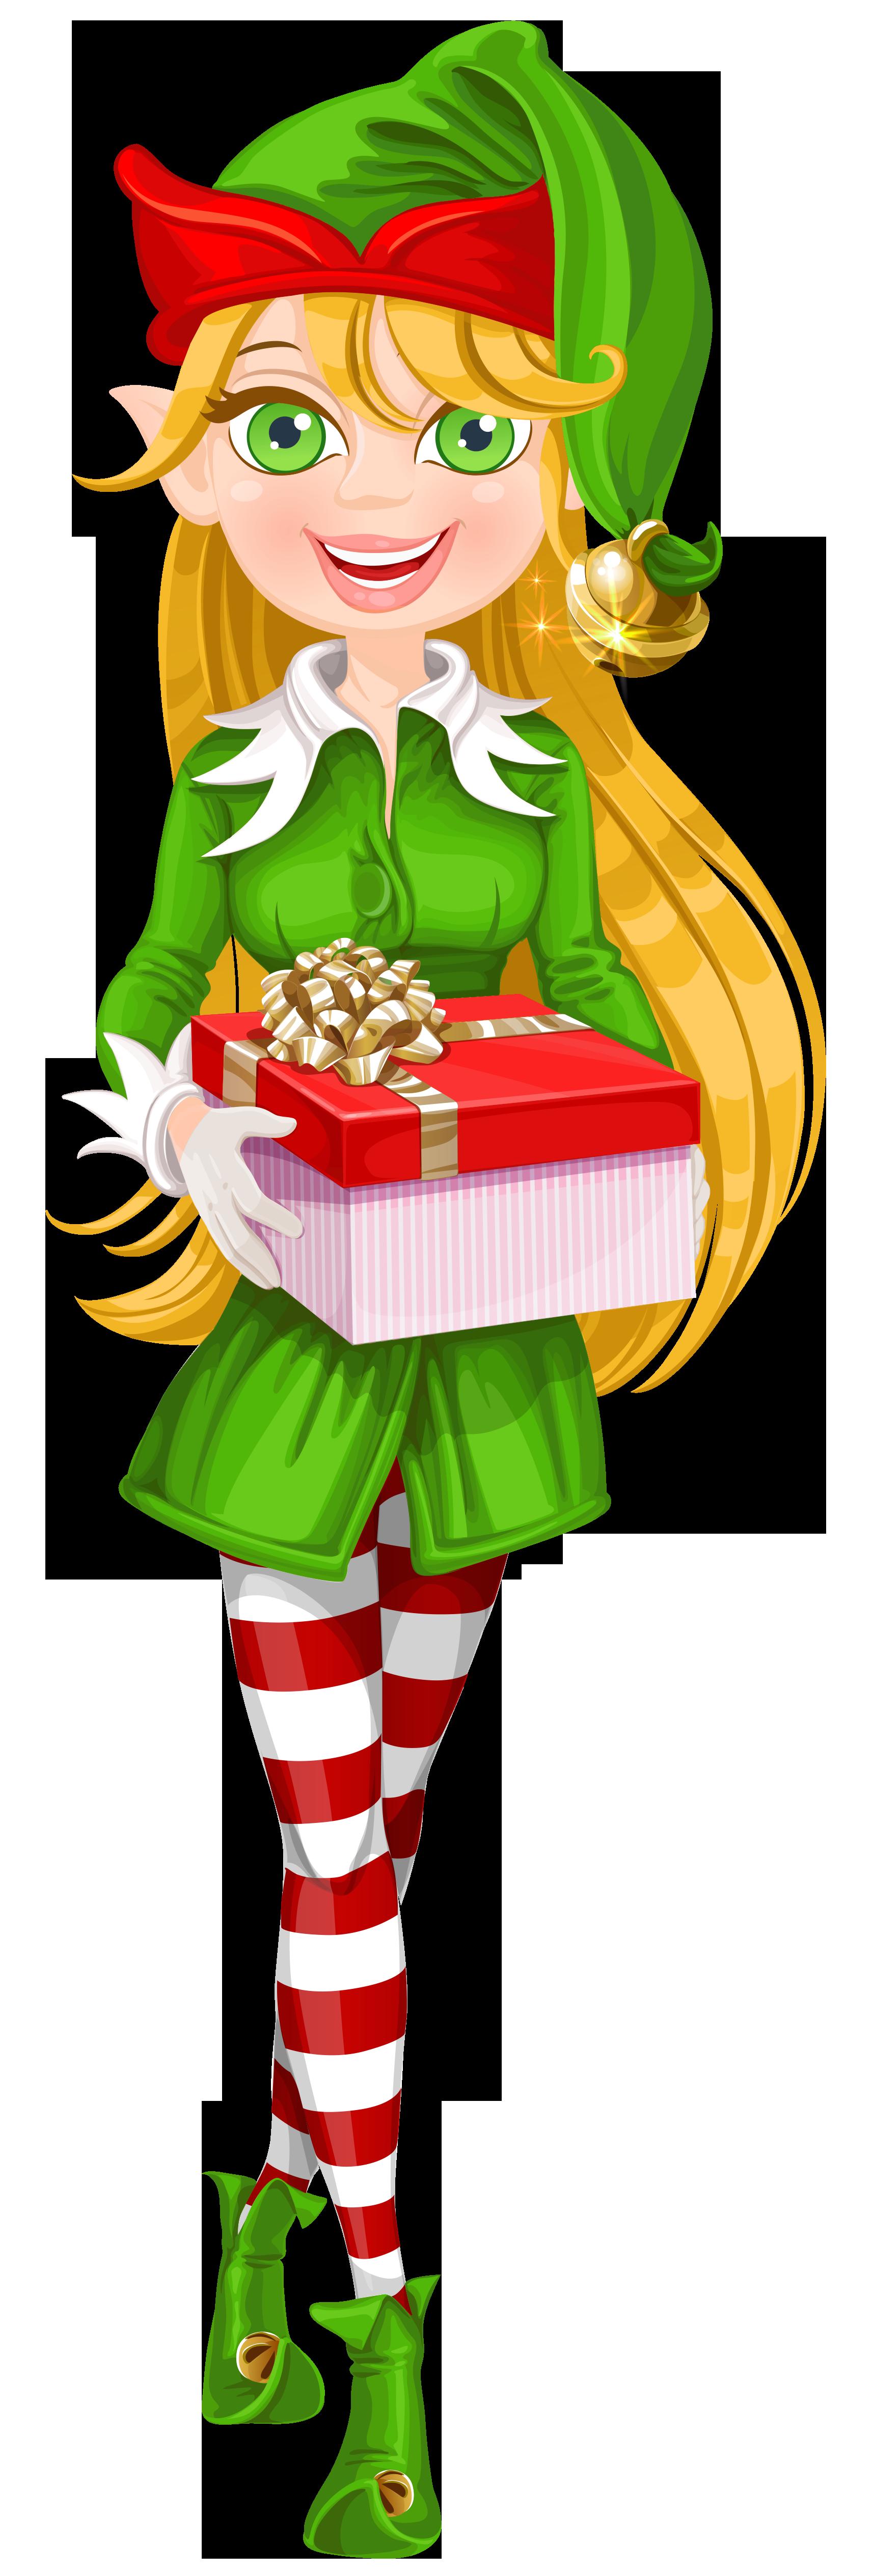 Christmas Elf Transparent PNG Clip Art Image.